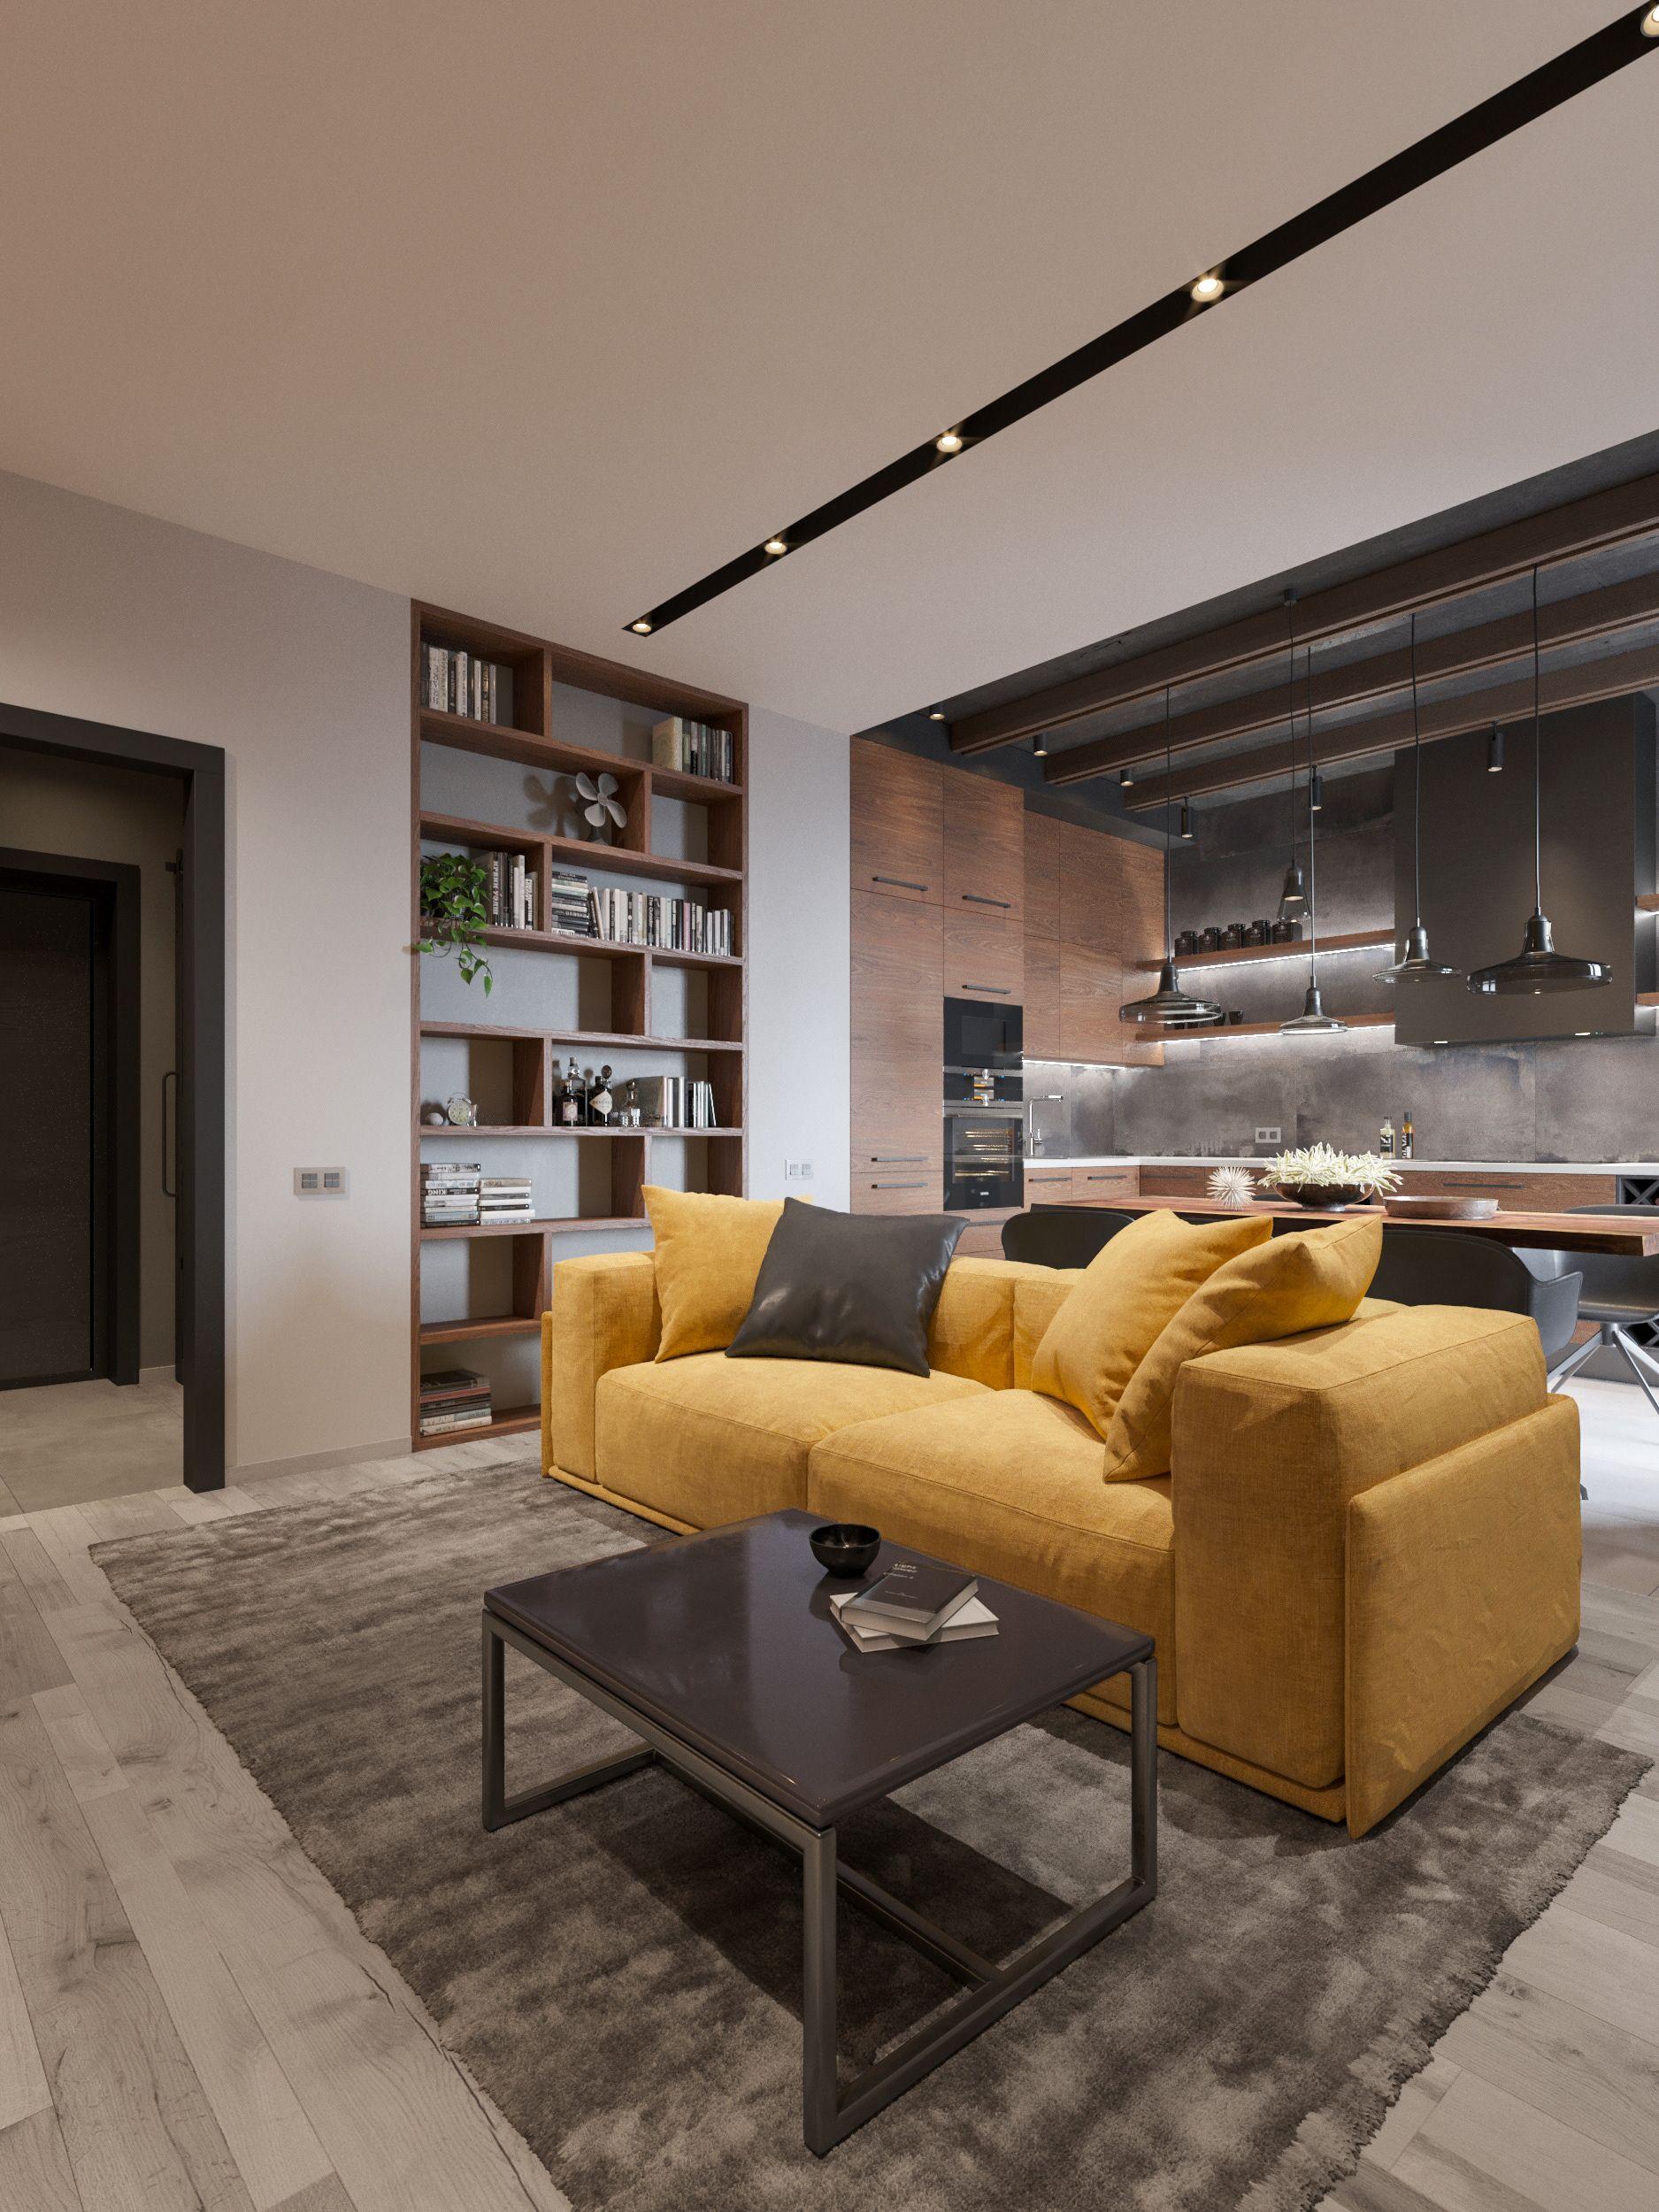 868 336 Exterior Home Design Ideas Remodel Pictures: Loft Interior Design, Apartment Interior, Loft Interiors